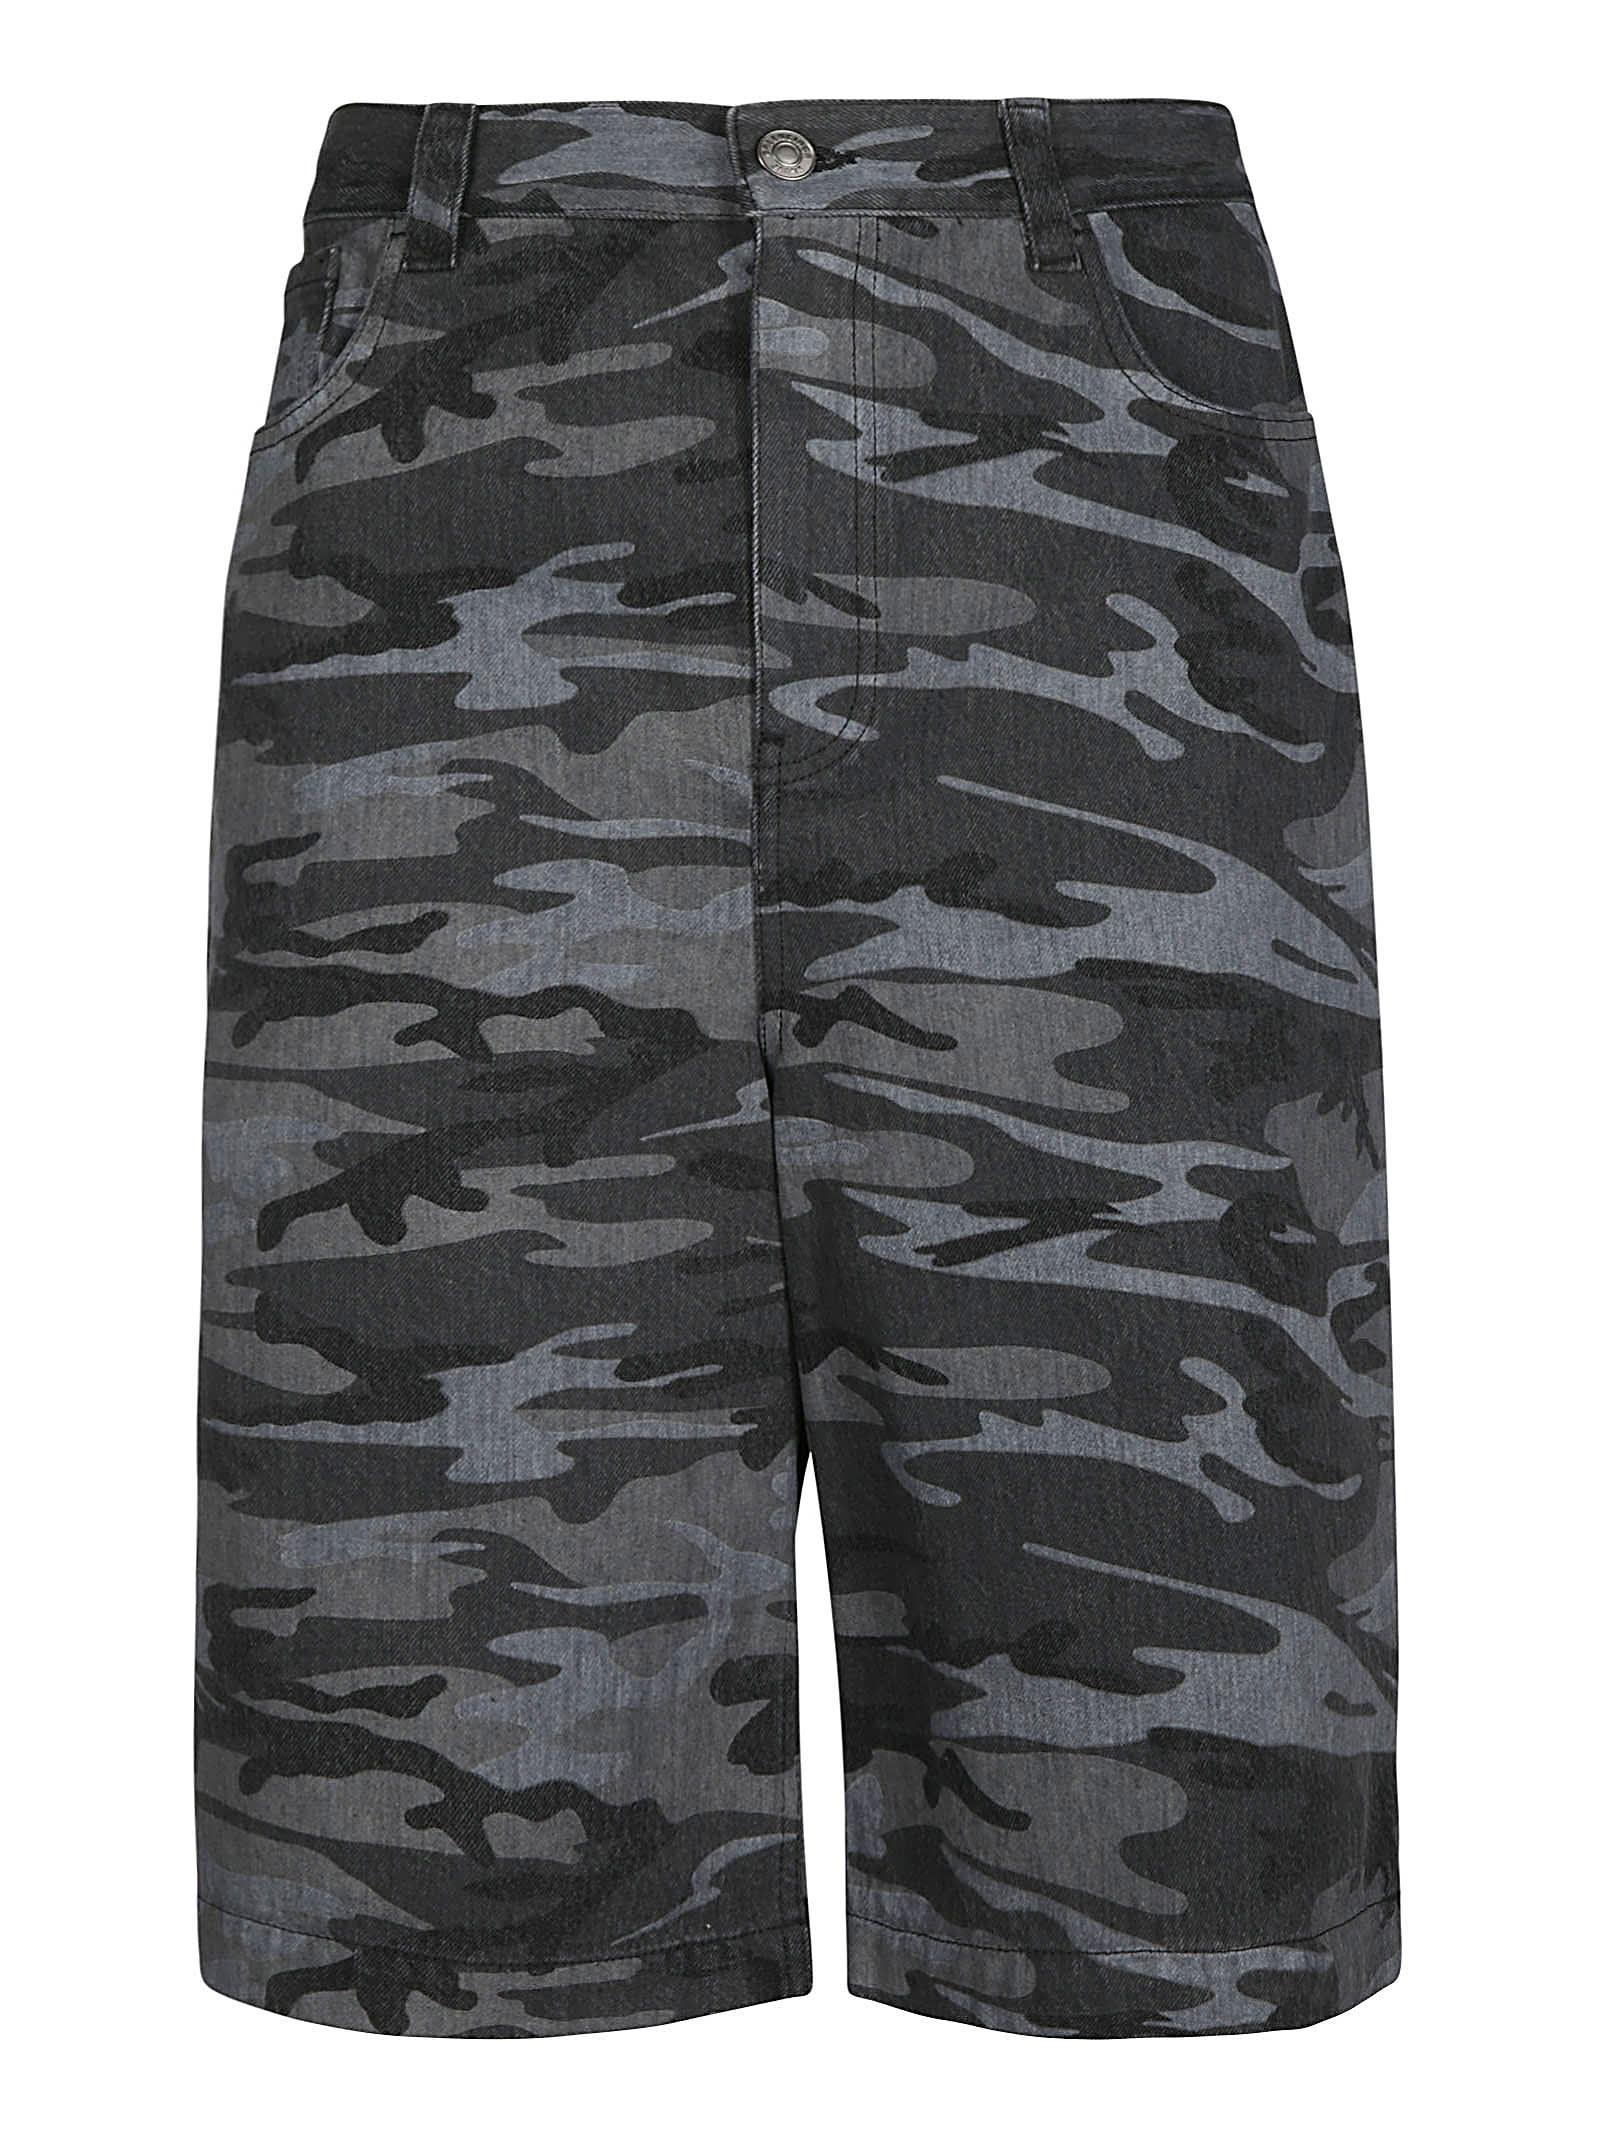 Balenciaga Camouflage Denim Bermuda Shorts